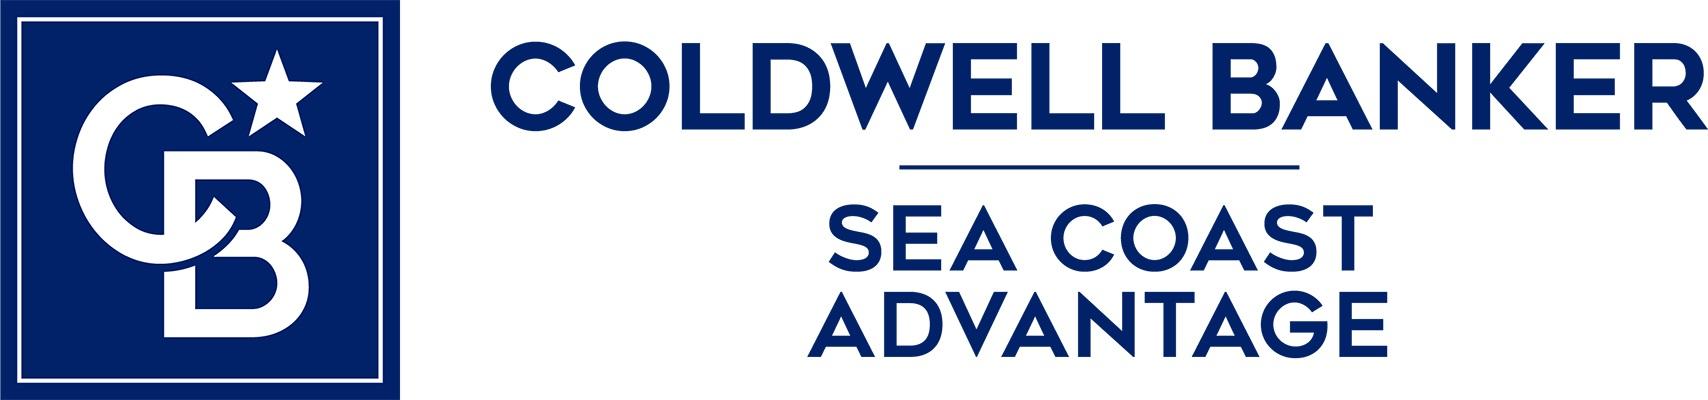 Claudia Unsicker - Coldwell Banker Sea Coast Advantage Realty Logo